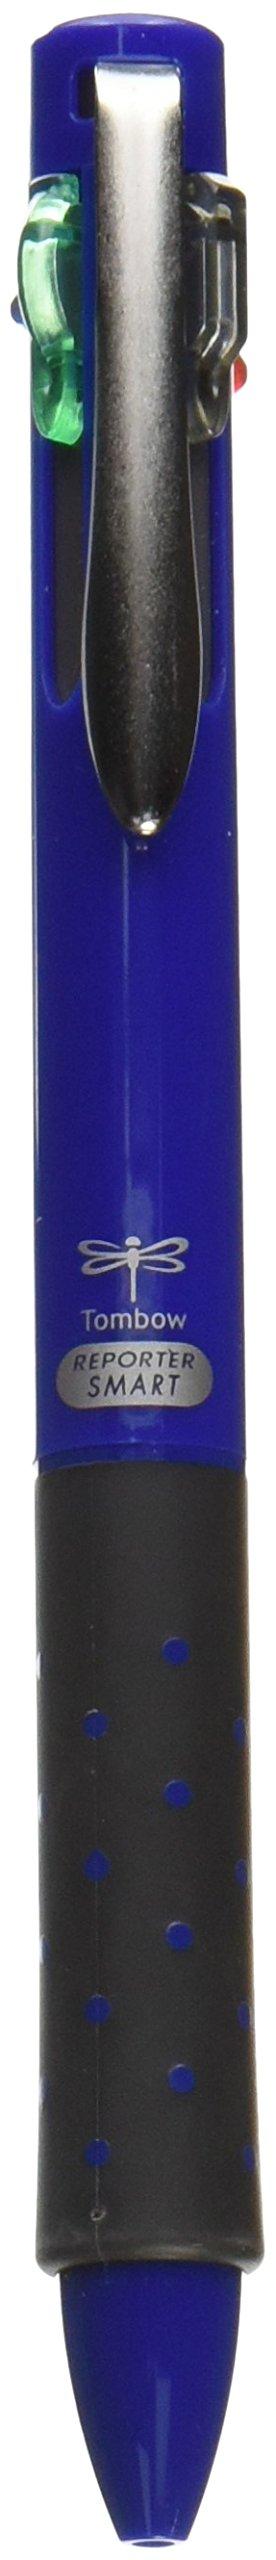 Tombow 4 Colors Ballpoint Pen, Reporter Smart 4, Blac ()